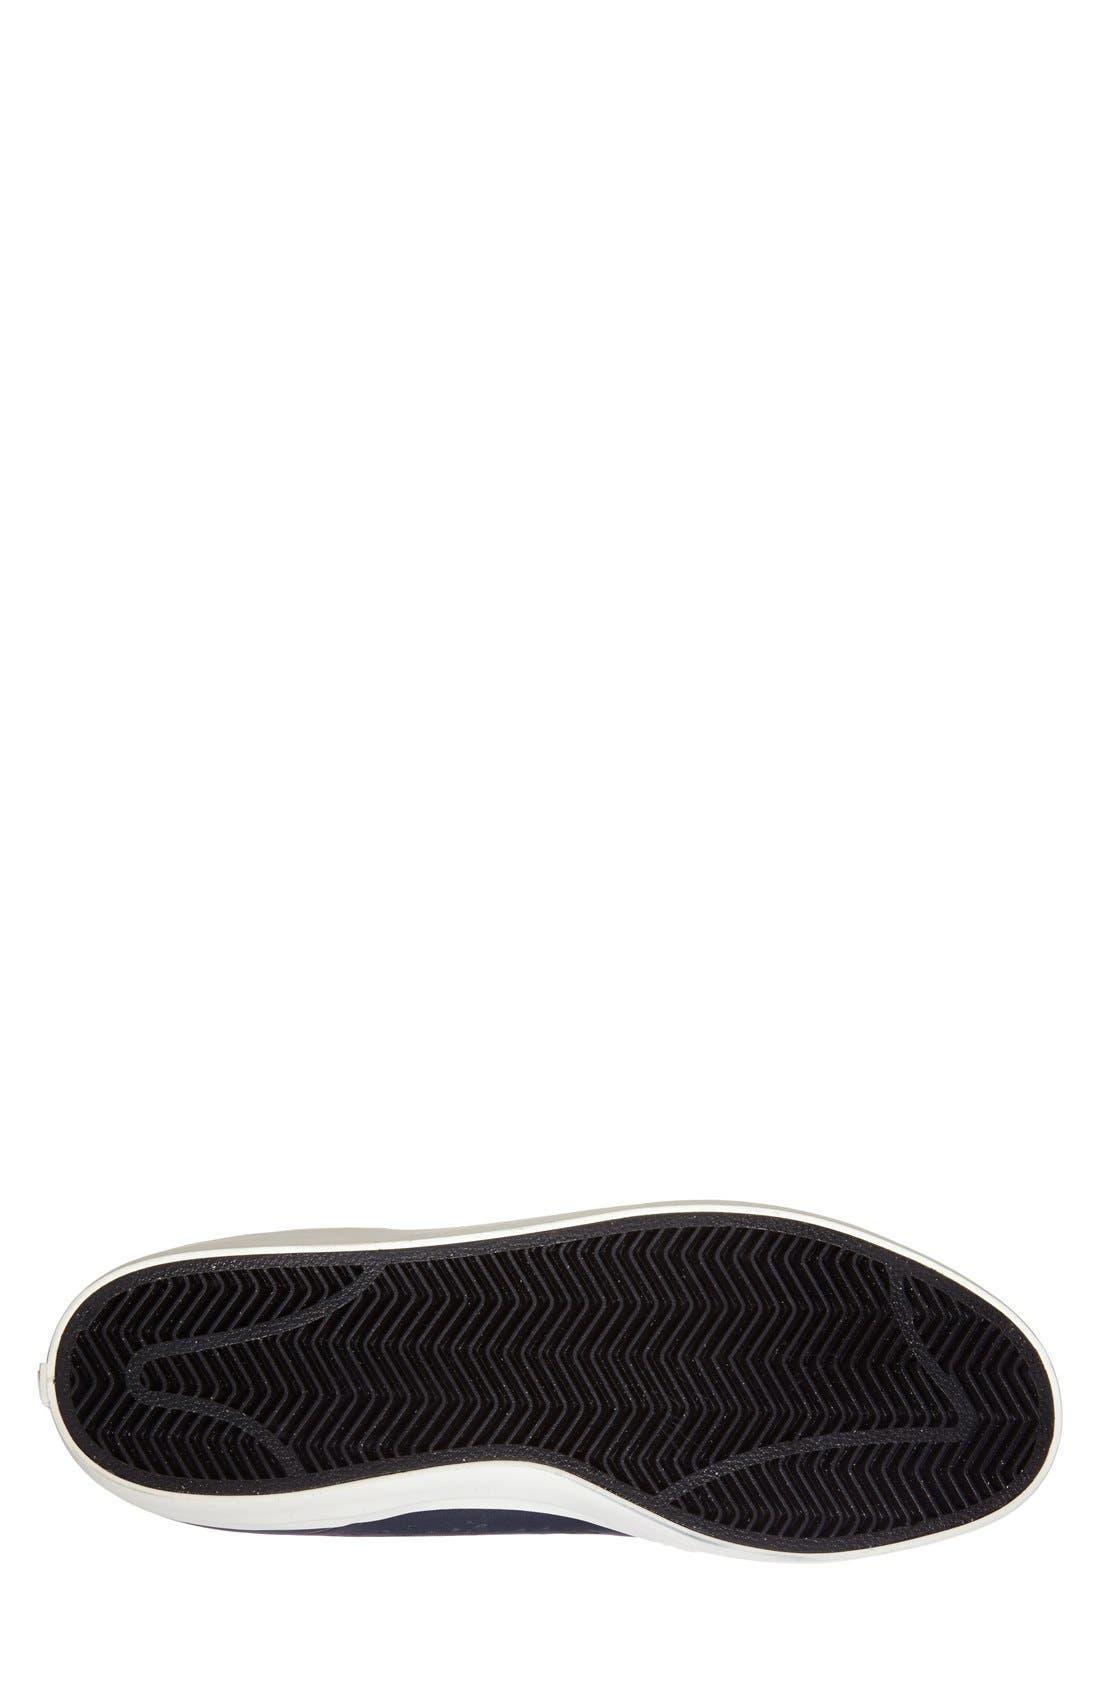 Alternate Image 4  - Nike 'Paul Rodriguez CTD LR SB' Skate Shoe (Men)